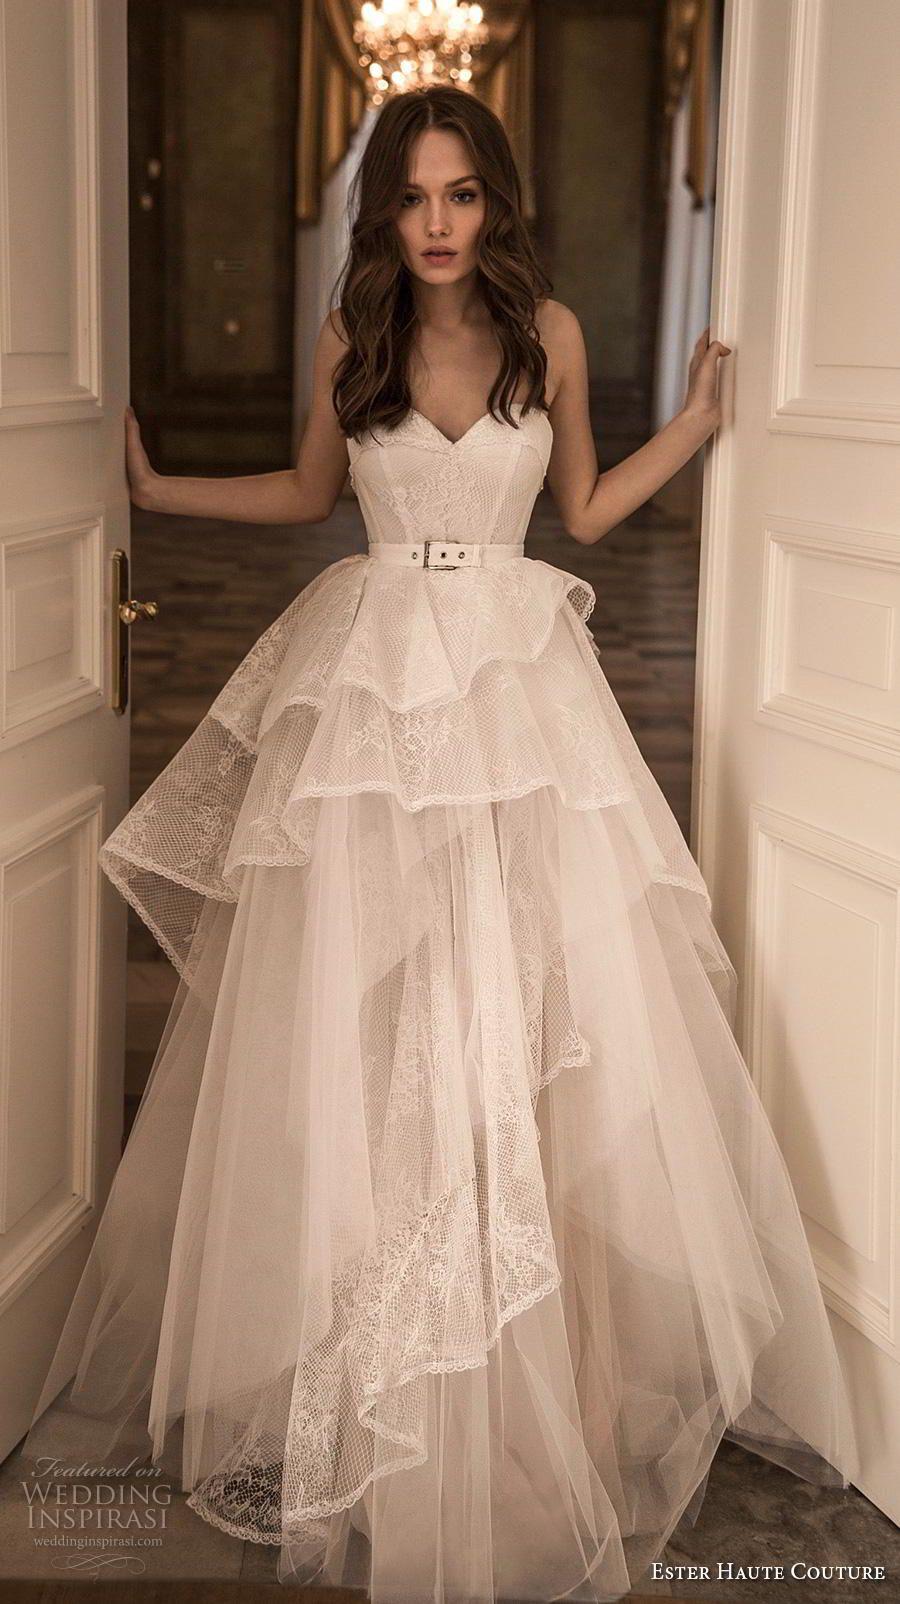 Ester Haute Couture 2018 2019 Wedding Dresses Wedding Inspirasi Bridal Gowns Wedding Dresses Strapless Fancy Dresses